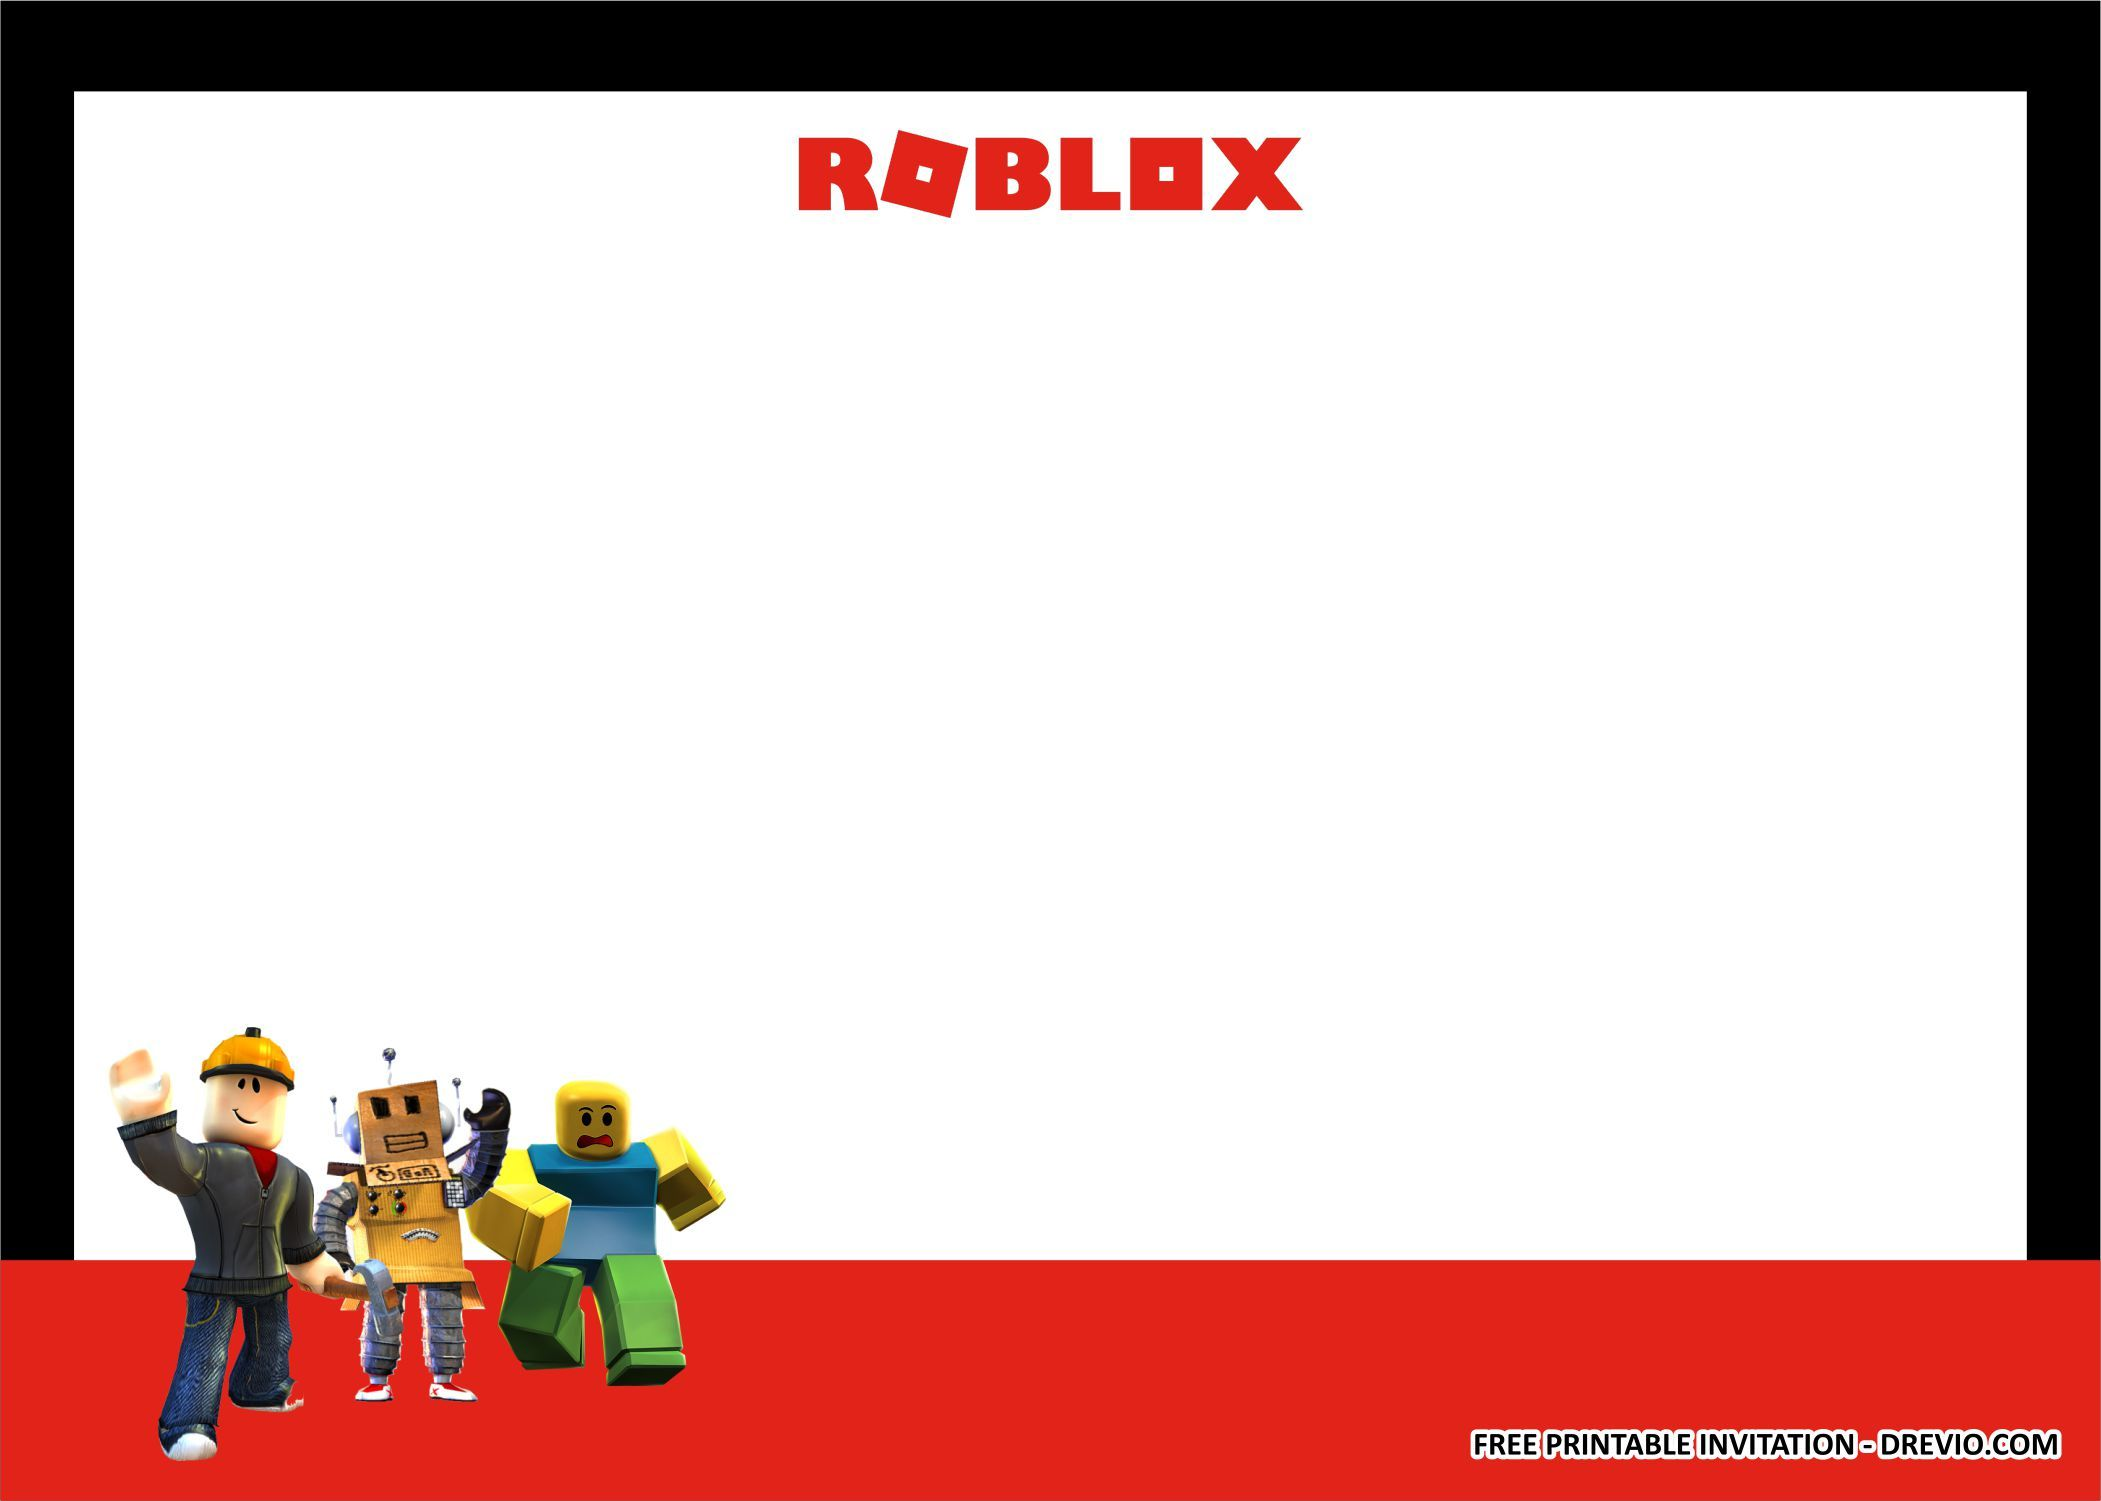 FREE PRINTABLE) ROBLOX Birthday Party Kits Templates Free